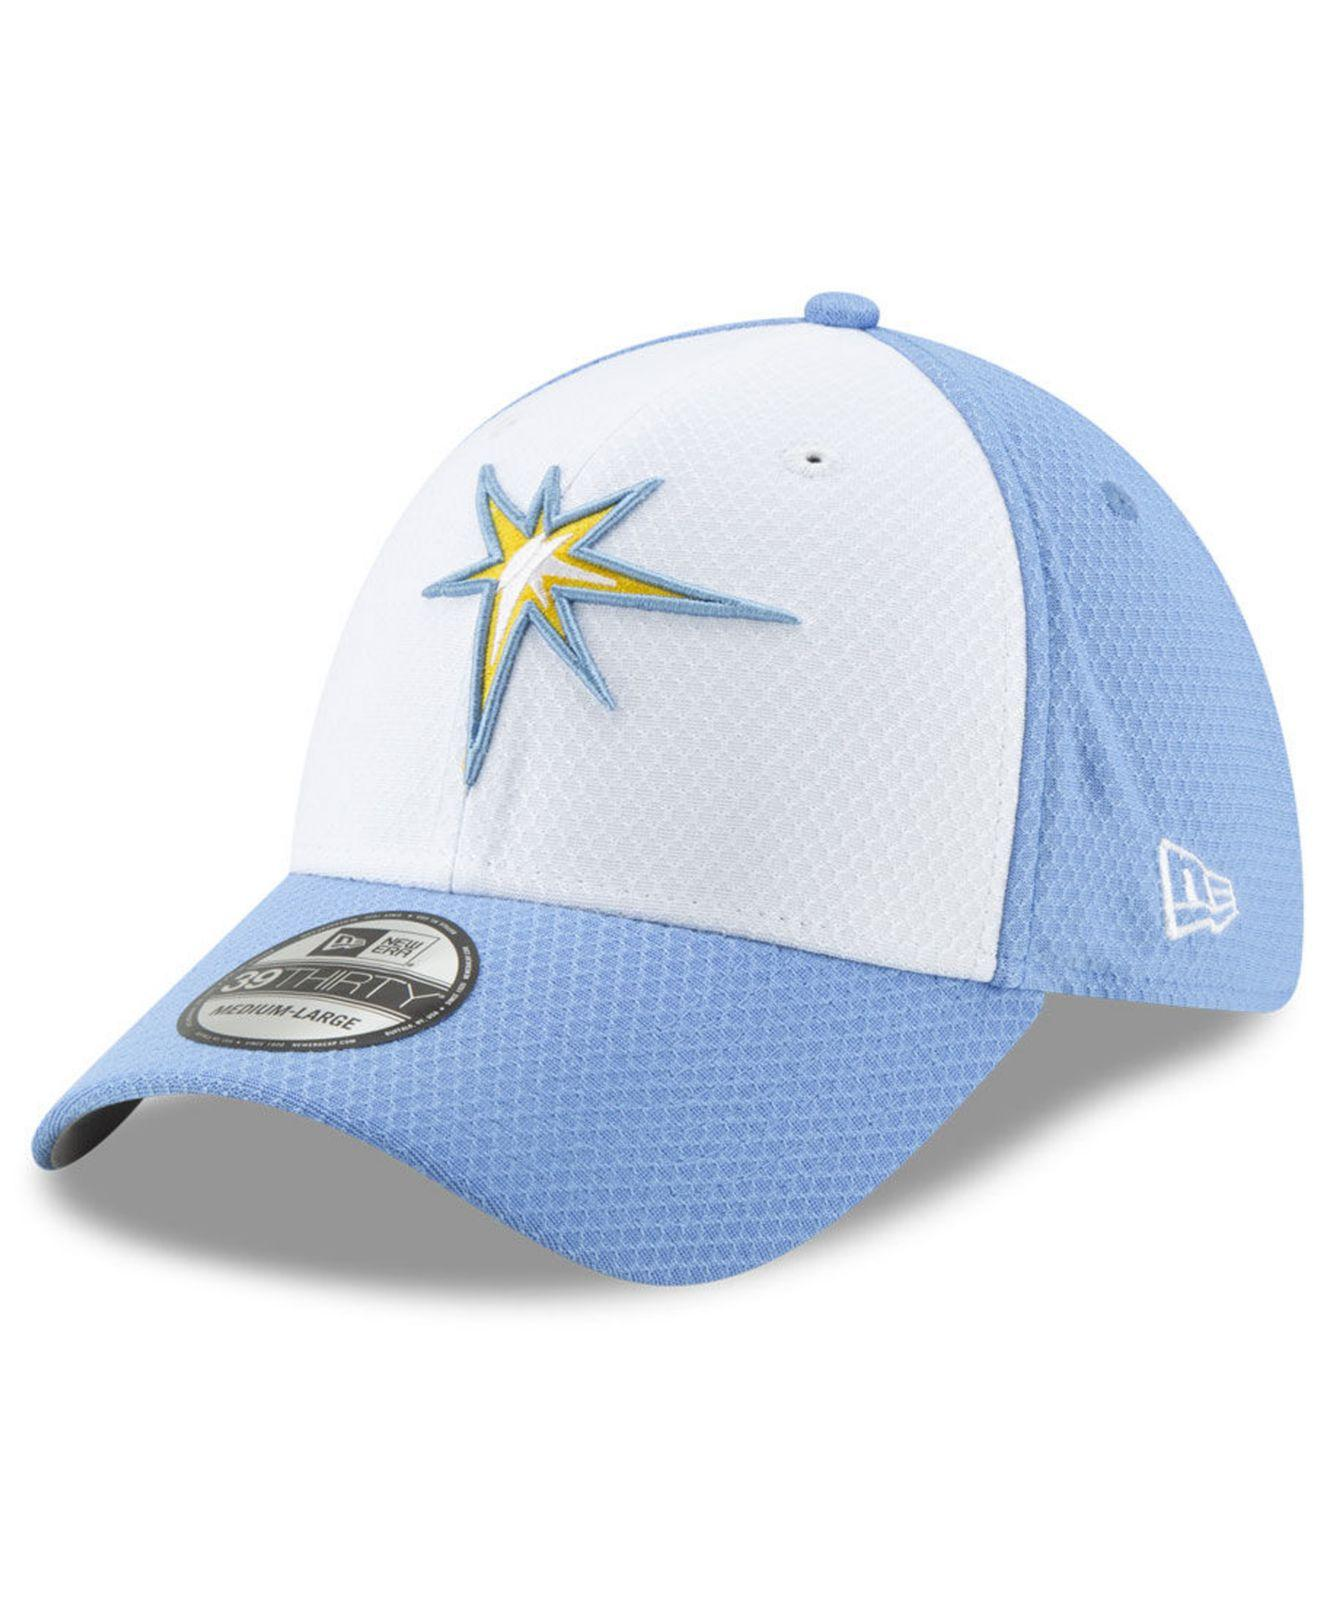 hot sale online 81b8b 59f49 KTZ. Men s Blue Tampa Bay Rays Batting Practice 39thirty Cap